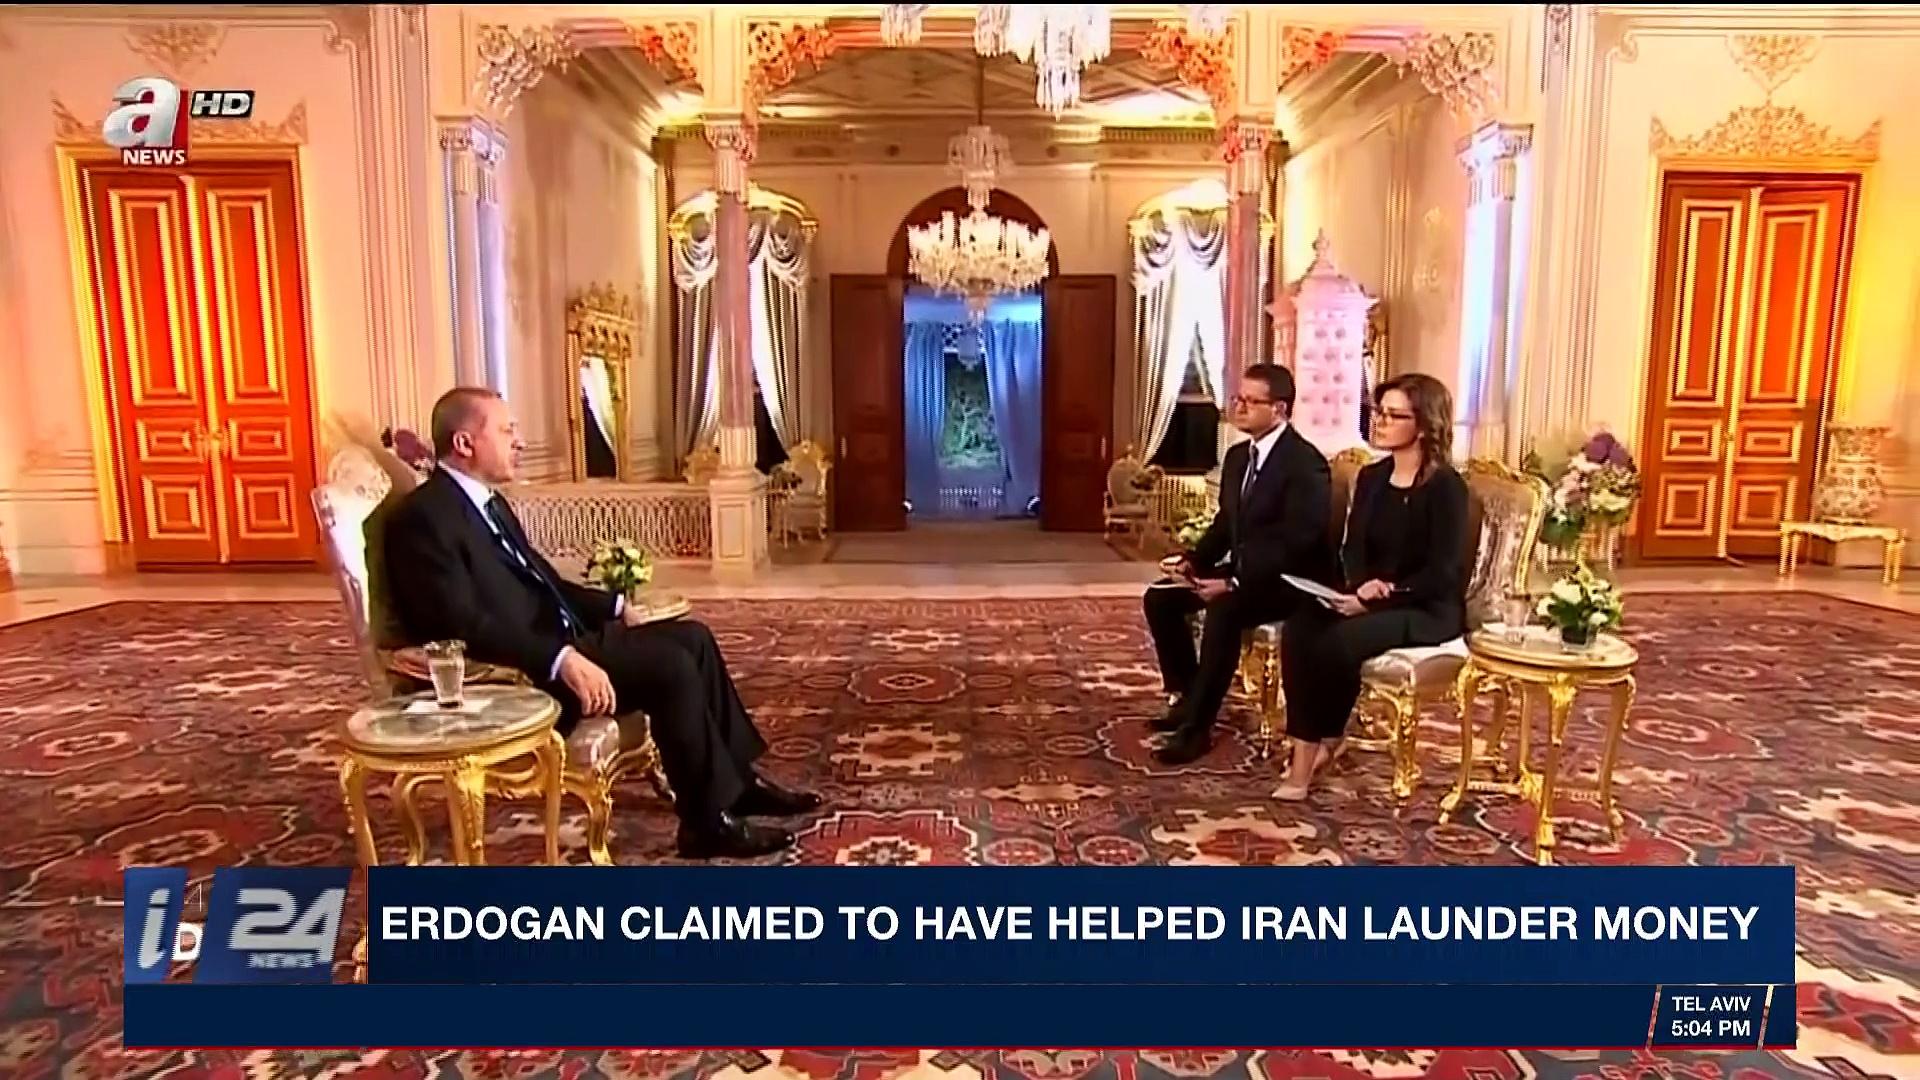 i24NEWS DESK | Erdogan claimed to have helped Iran launder money | Friday, December 1st 2017